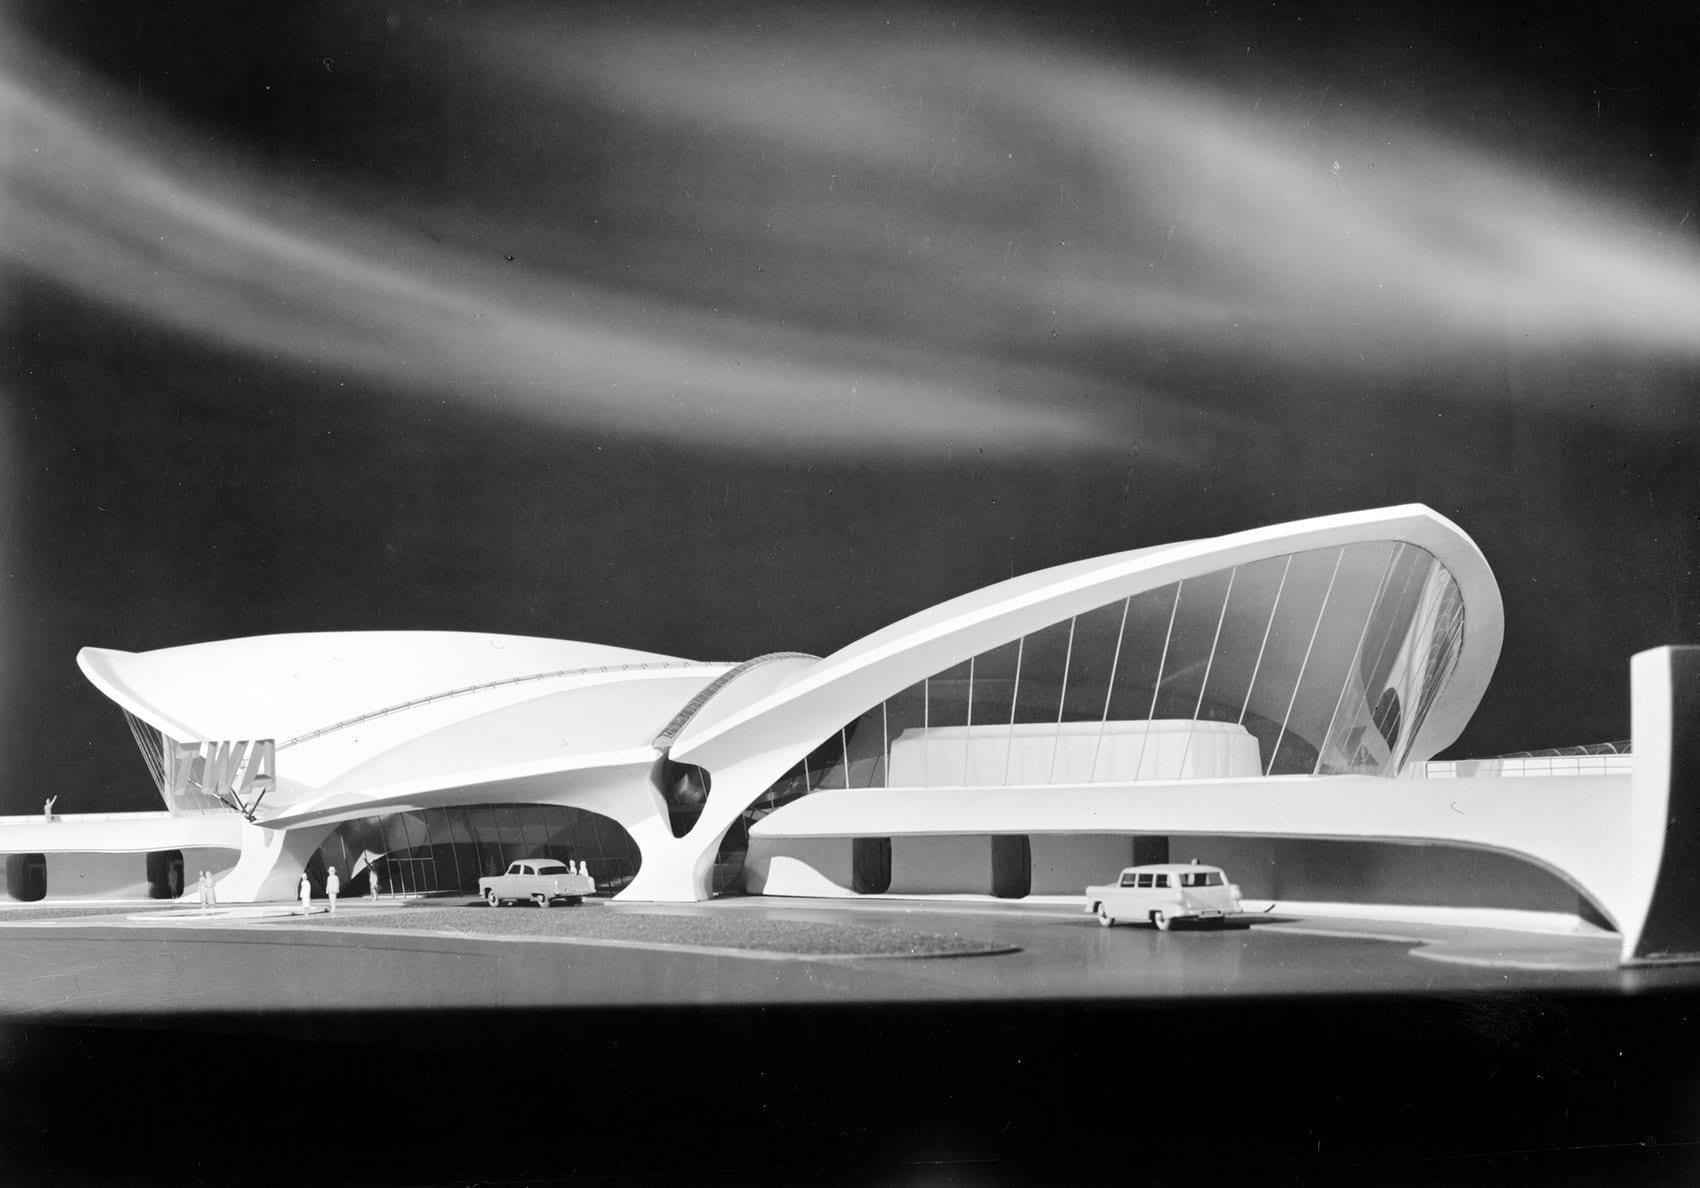 Model front view of TWA terminal at JFK airport